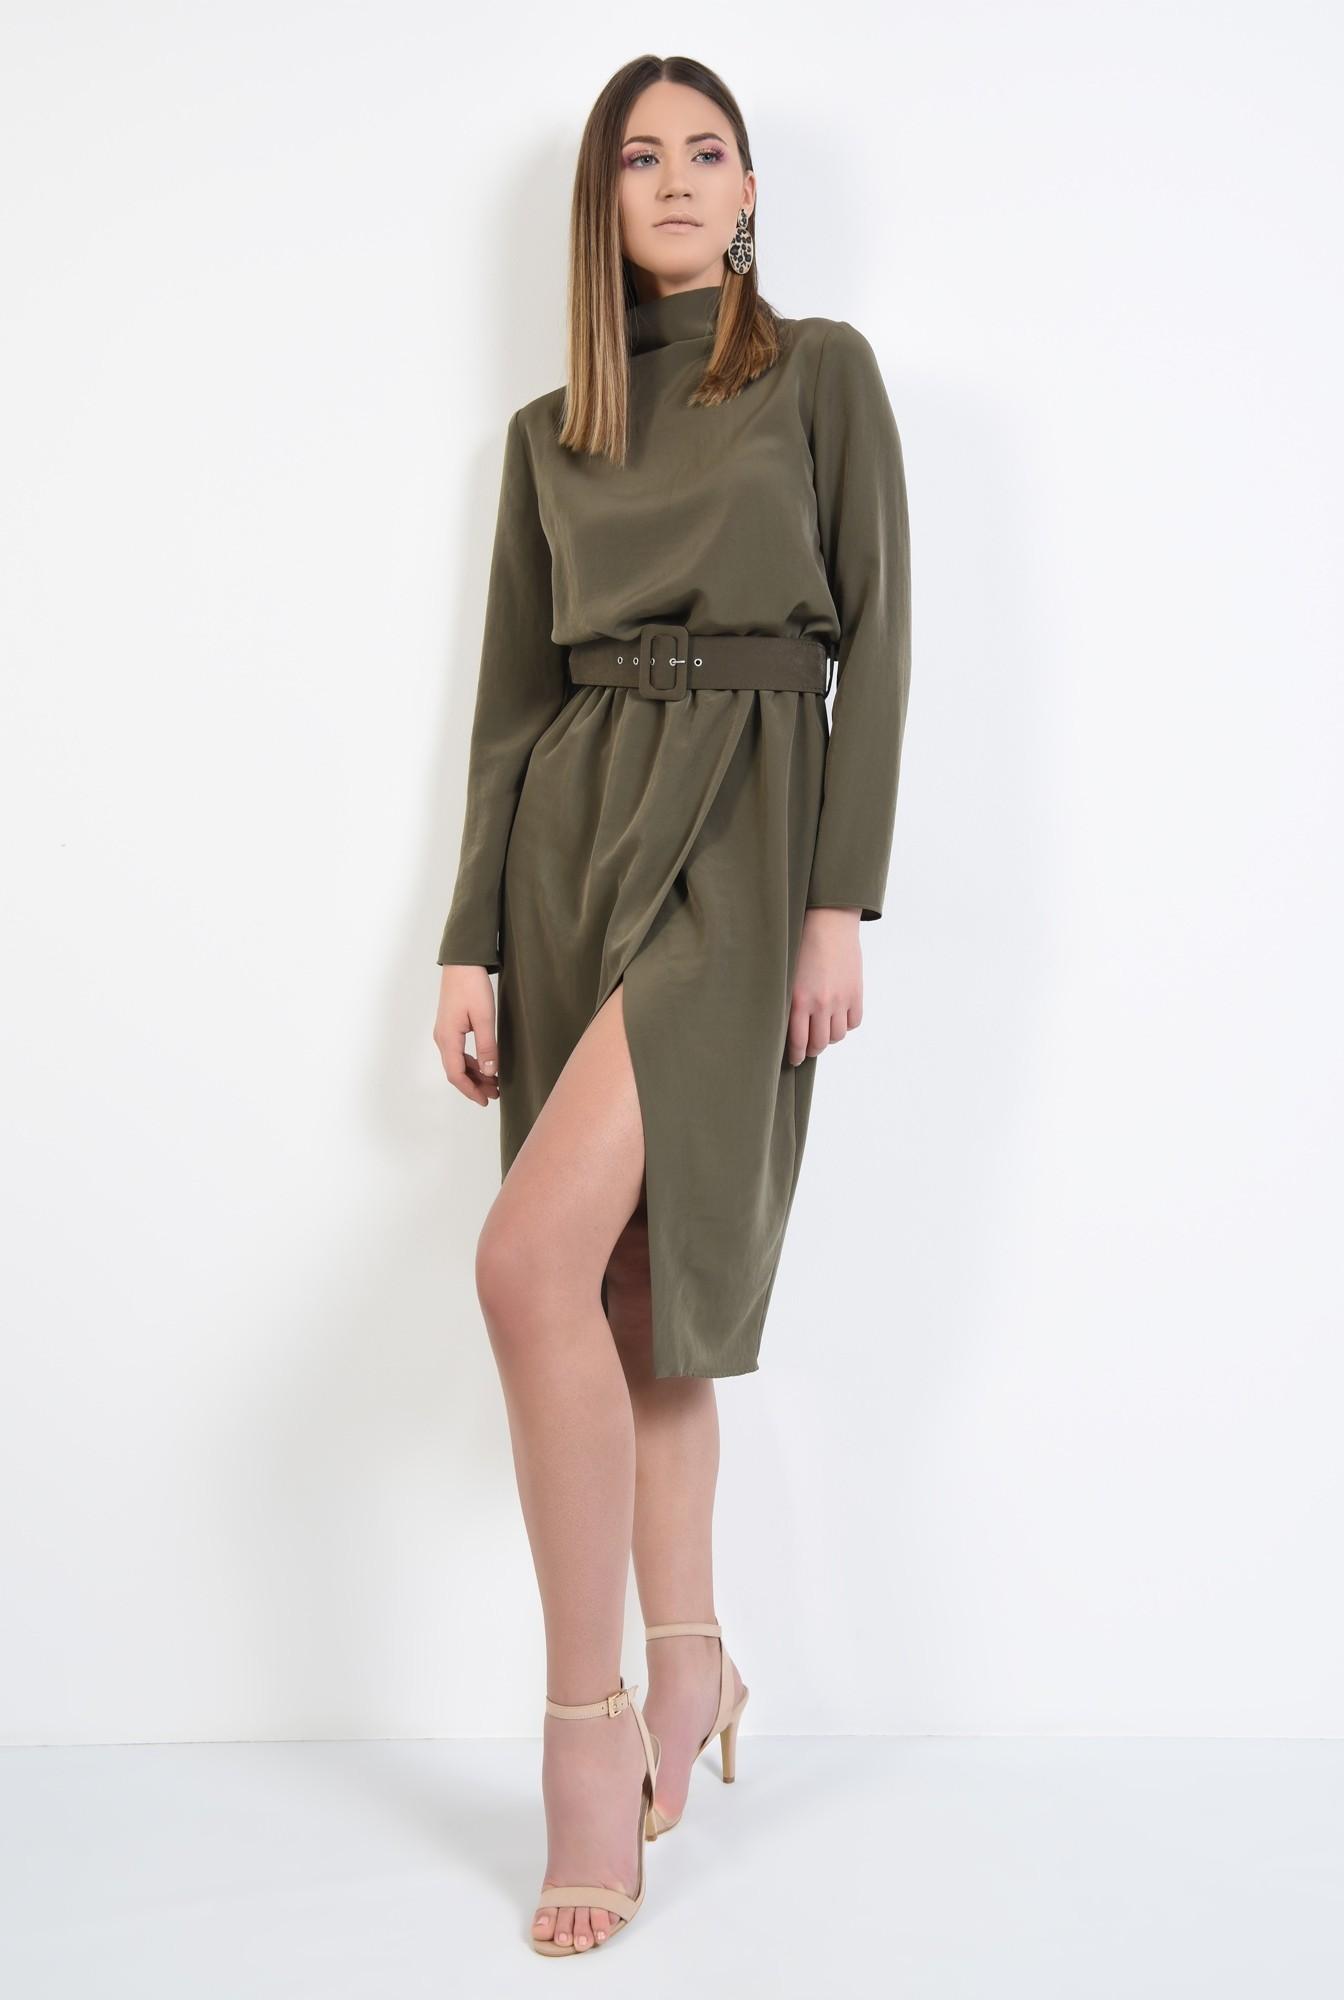 3 - rochie eleganta, de zi, verde, kaki, cu curea, maneci lungi